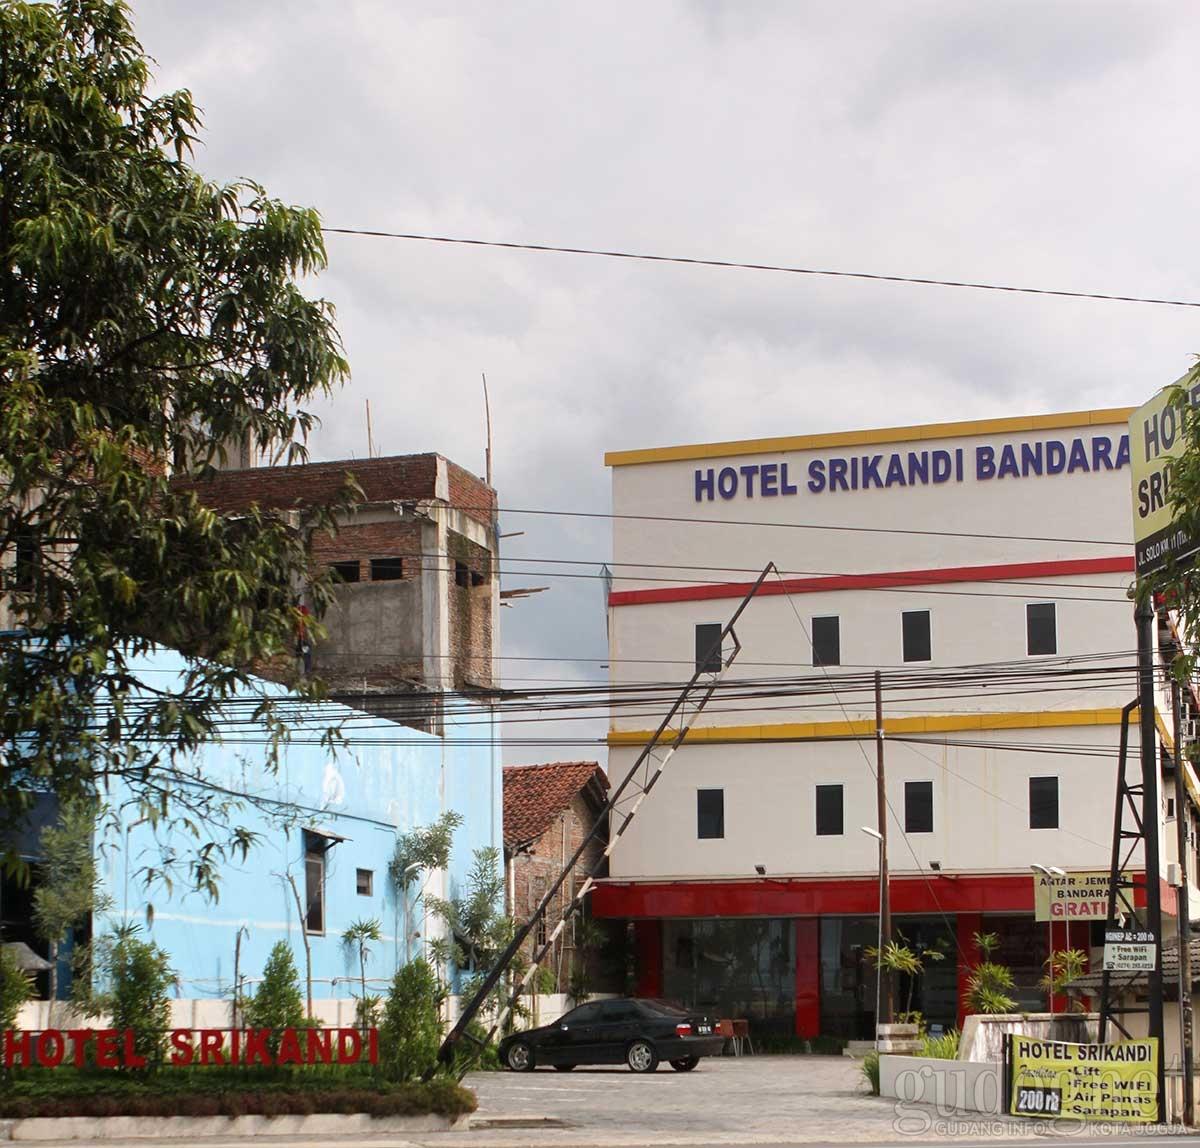 Hotel Srikandi Bandara Yogya